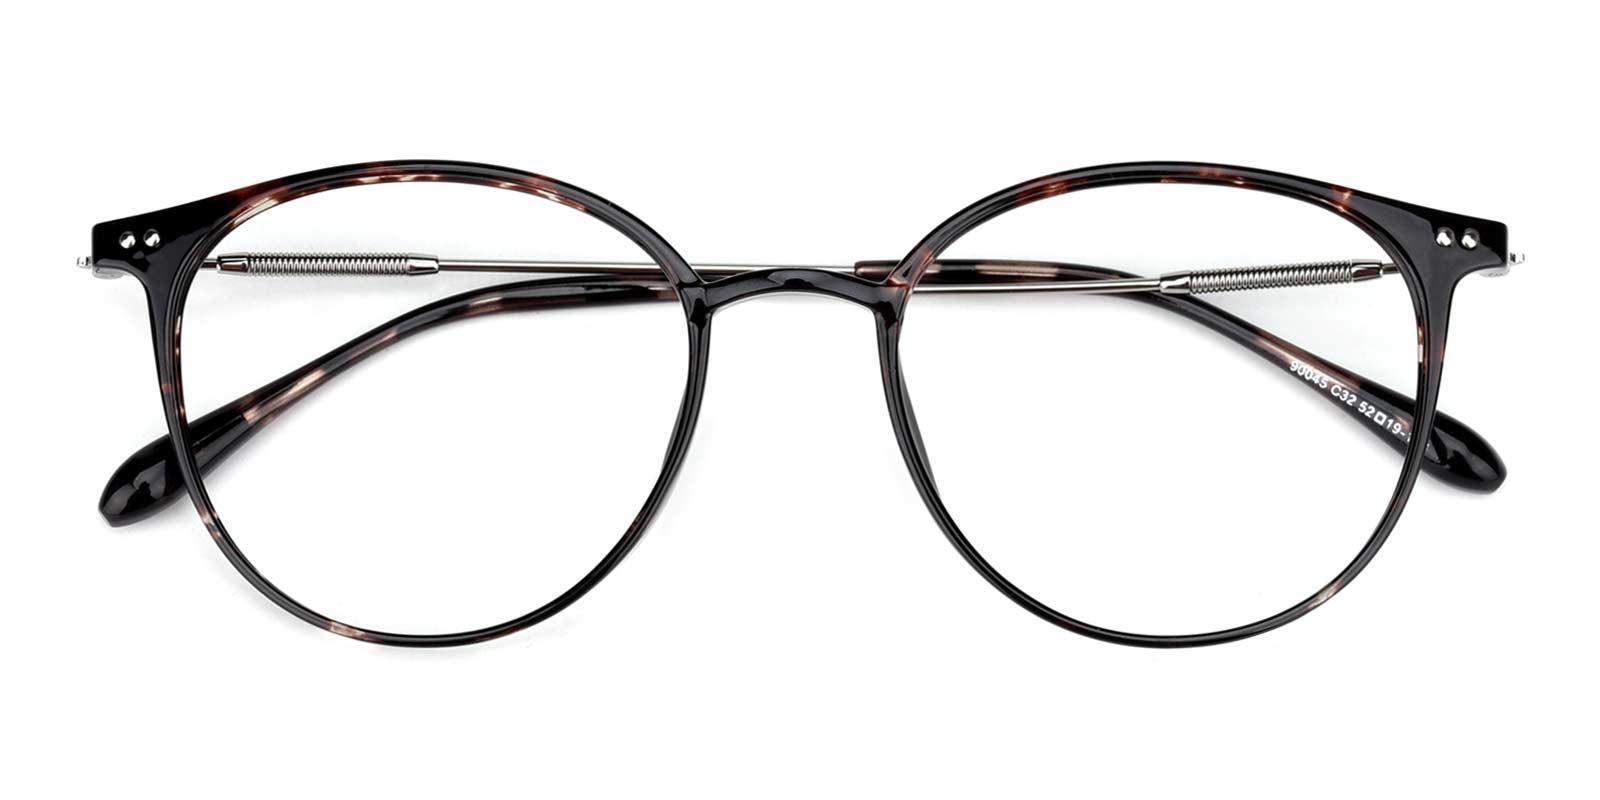 Guardian-Tortoise-Round-TR-Eyeglasses-detail